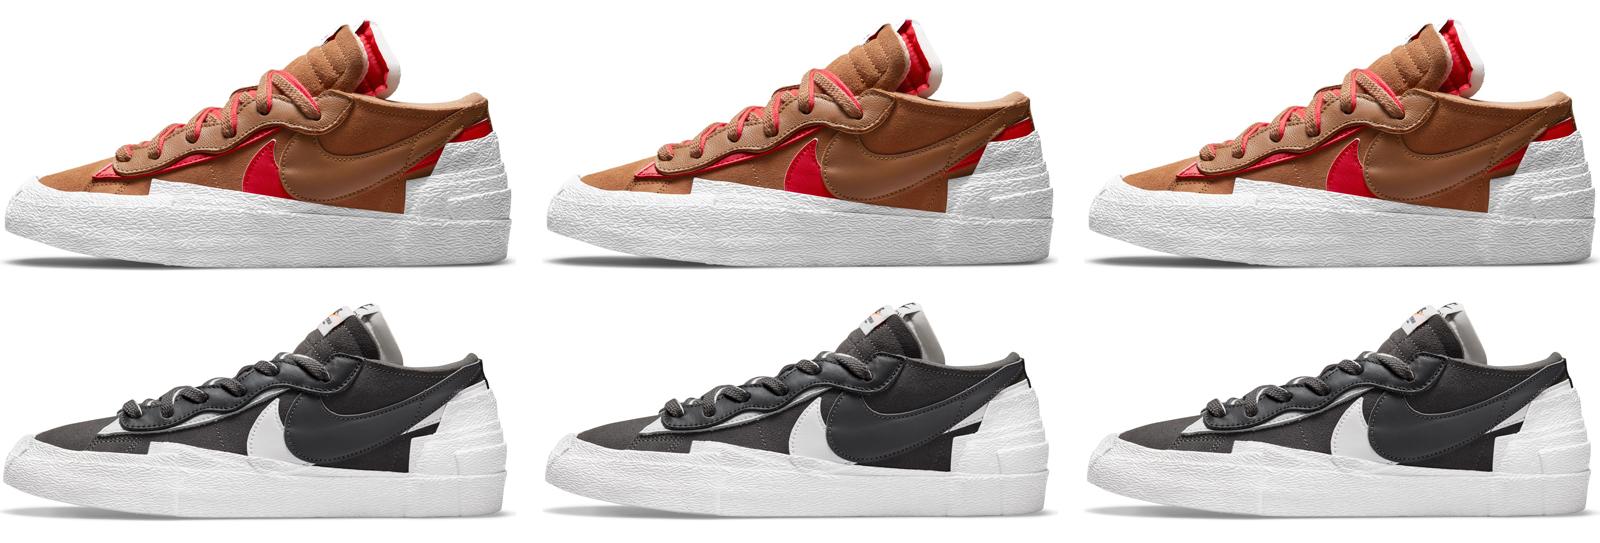 NikeLab DSM LDN